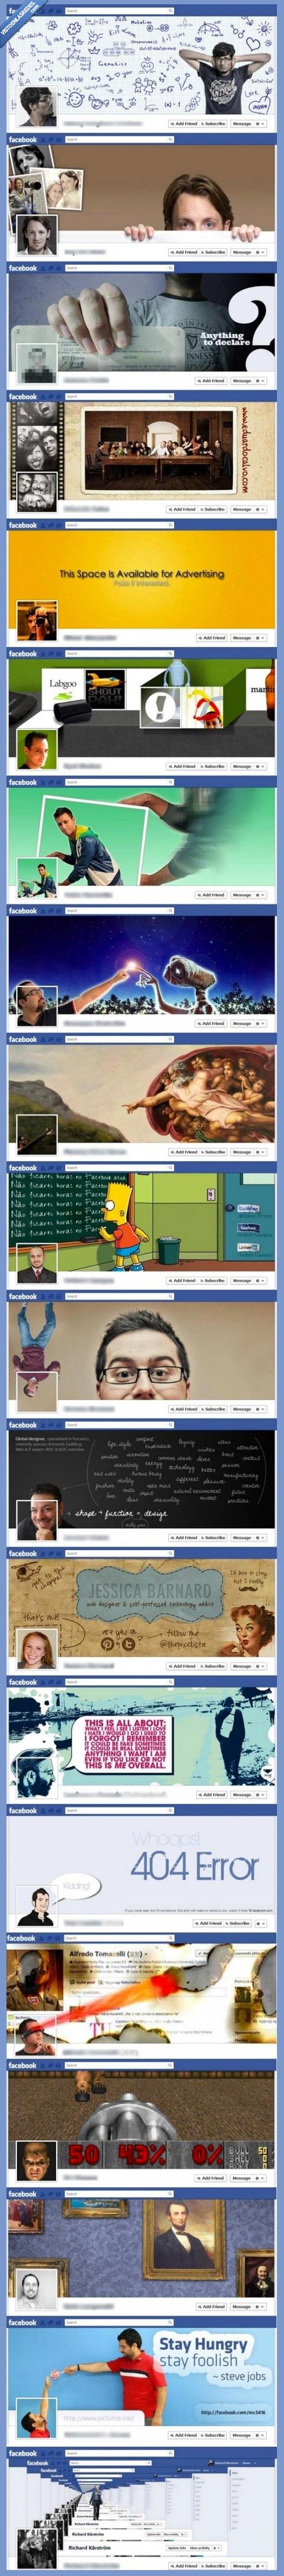 creativo,facebook,imaginativo,original,portadas